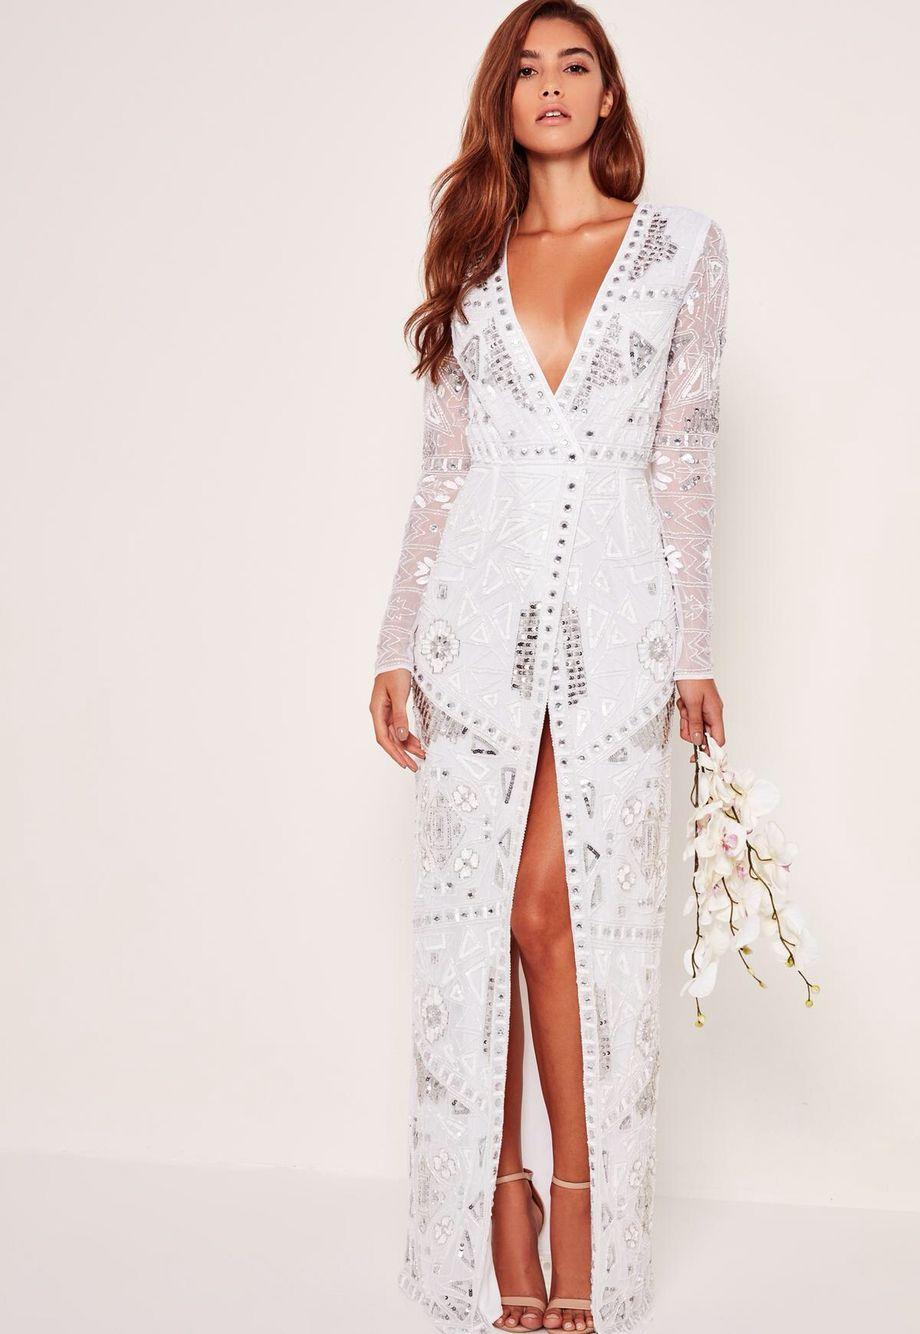 86c88738 missguided bridal sequin wrap maxi dress | prom dress favorites ...